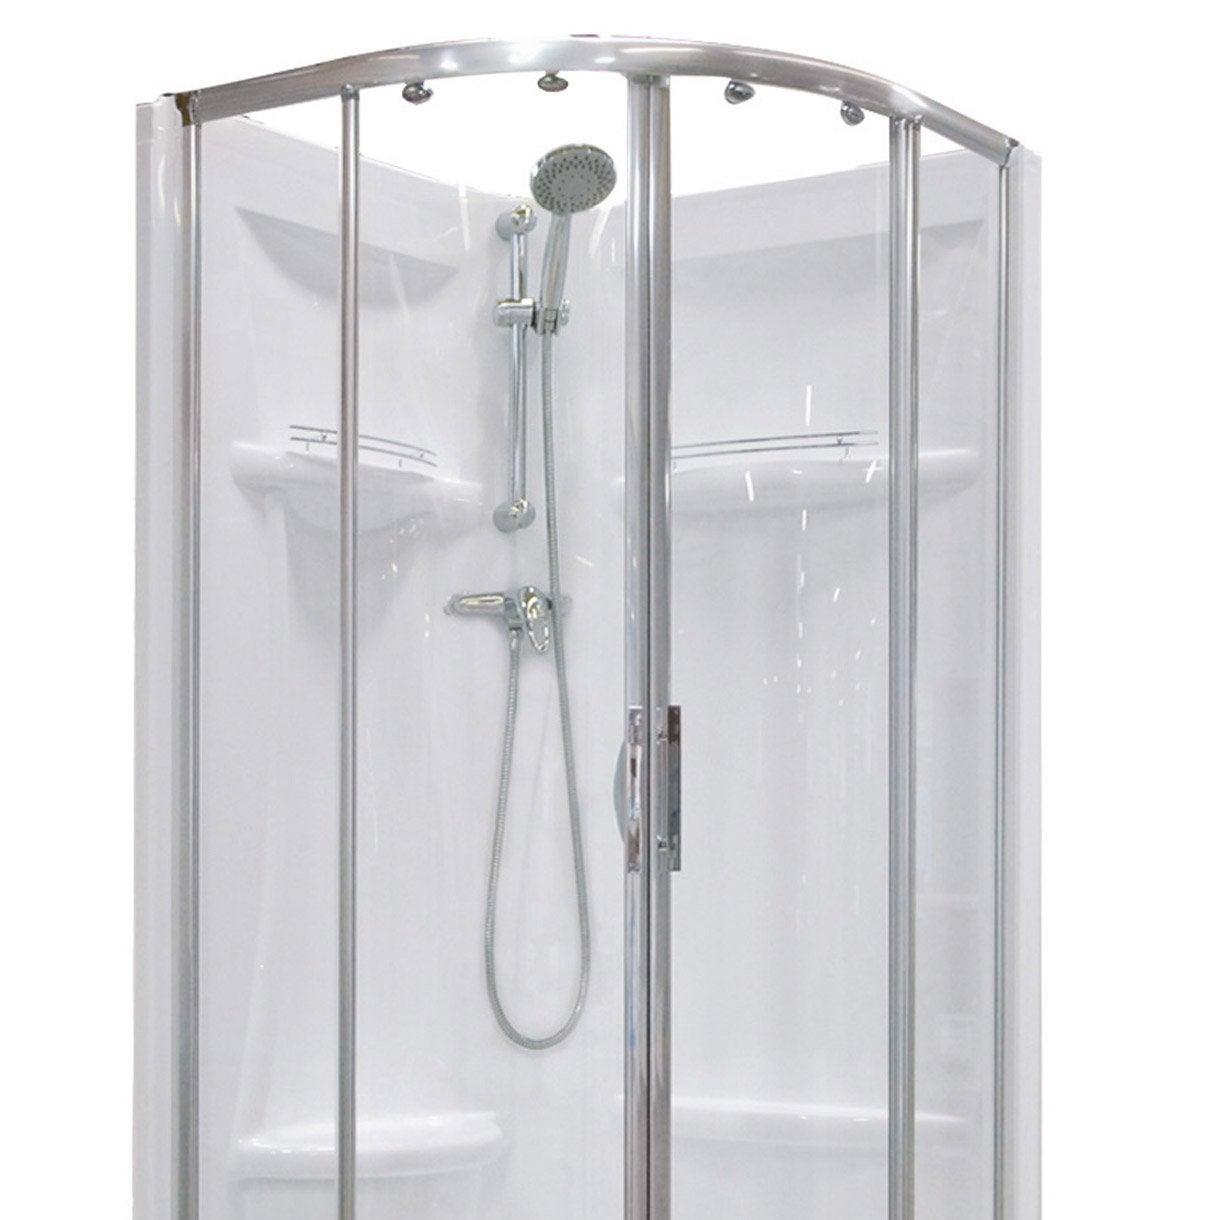 Cabine de douche 1 4 de cercle 90x90 cm dana leroy merlin - Destockage cabine de douche ...